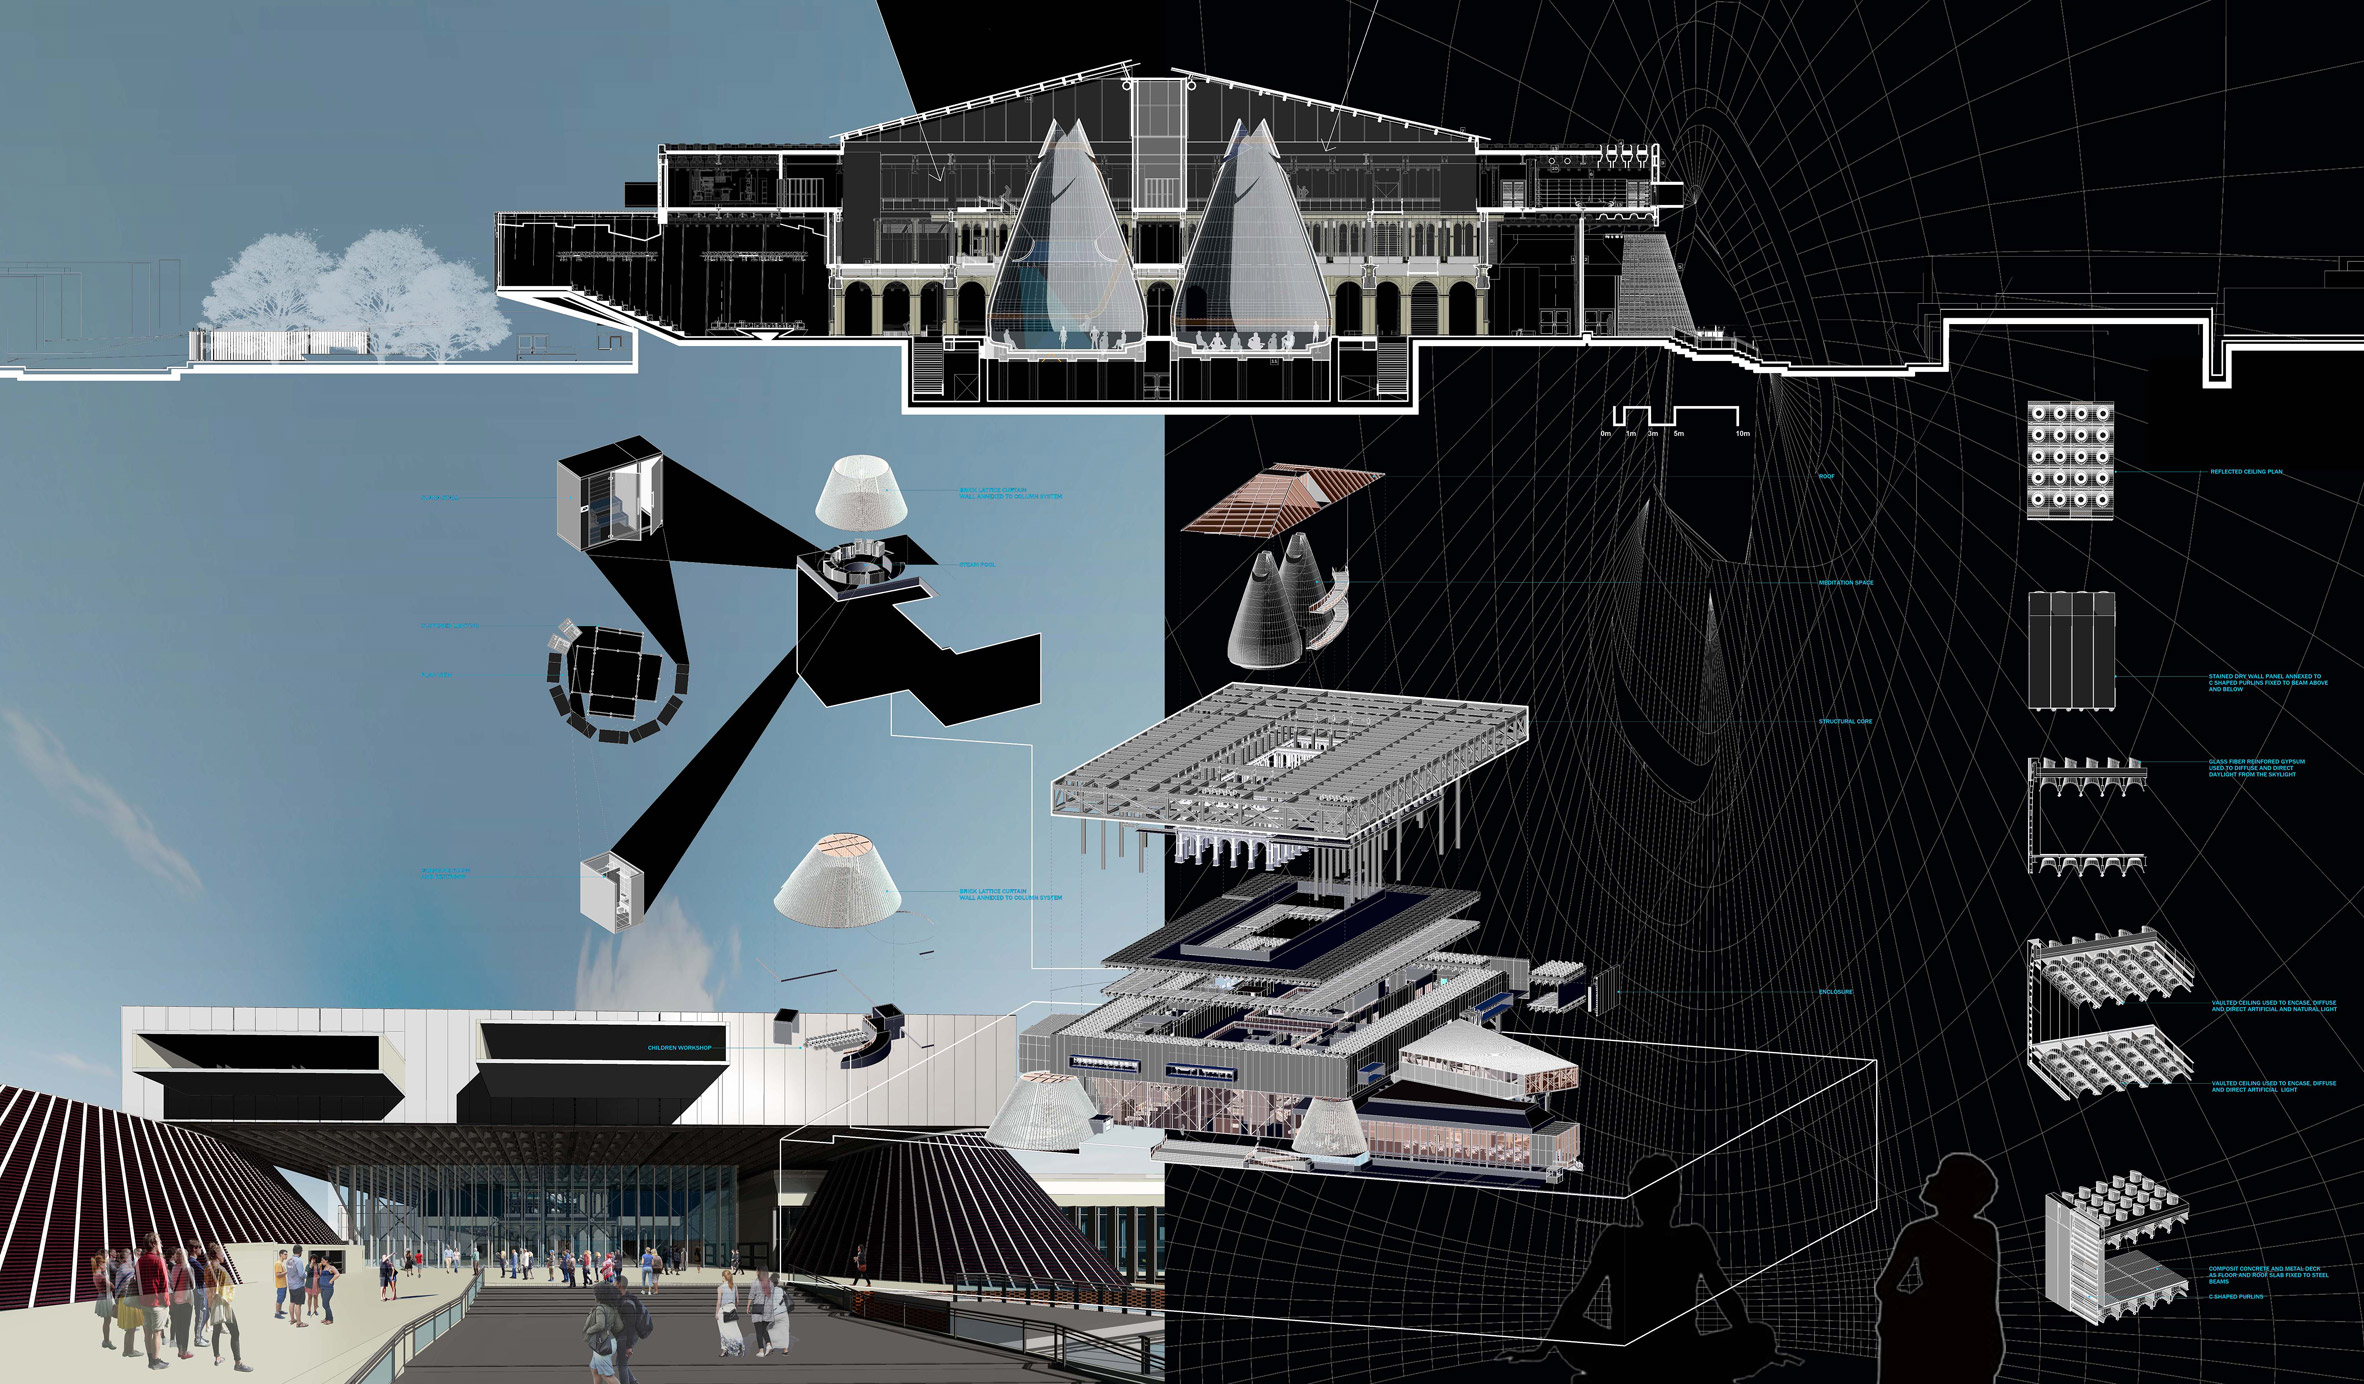 Jason Pinnock is an architecture student